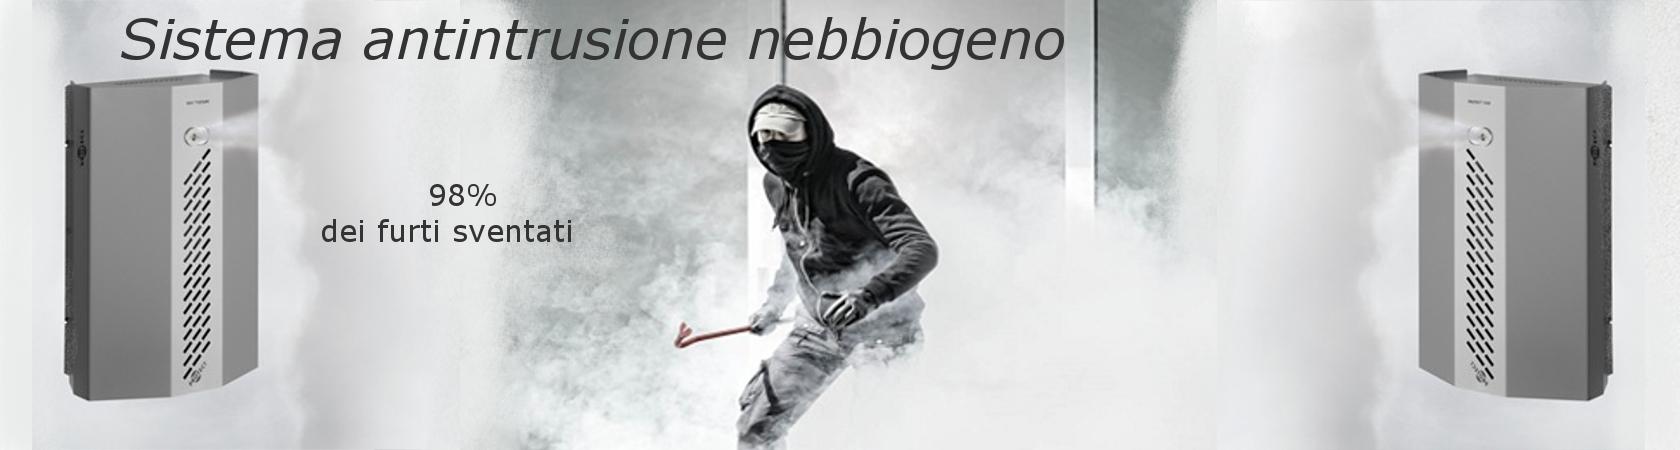 Nebbiogeno41